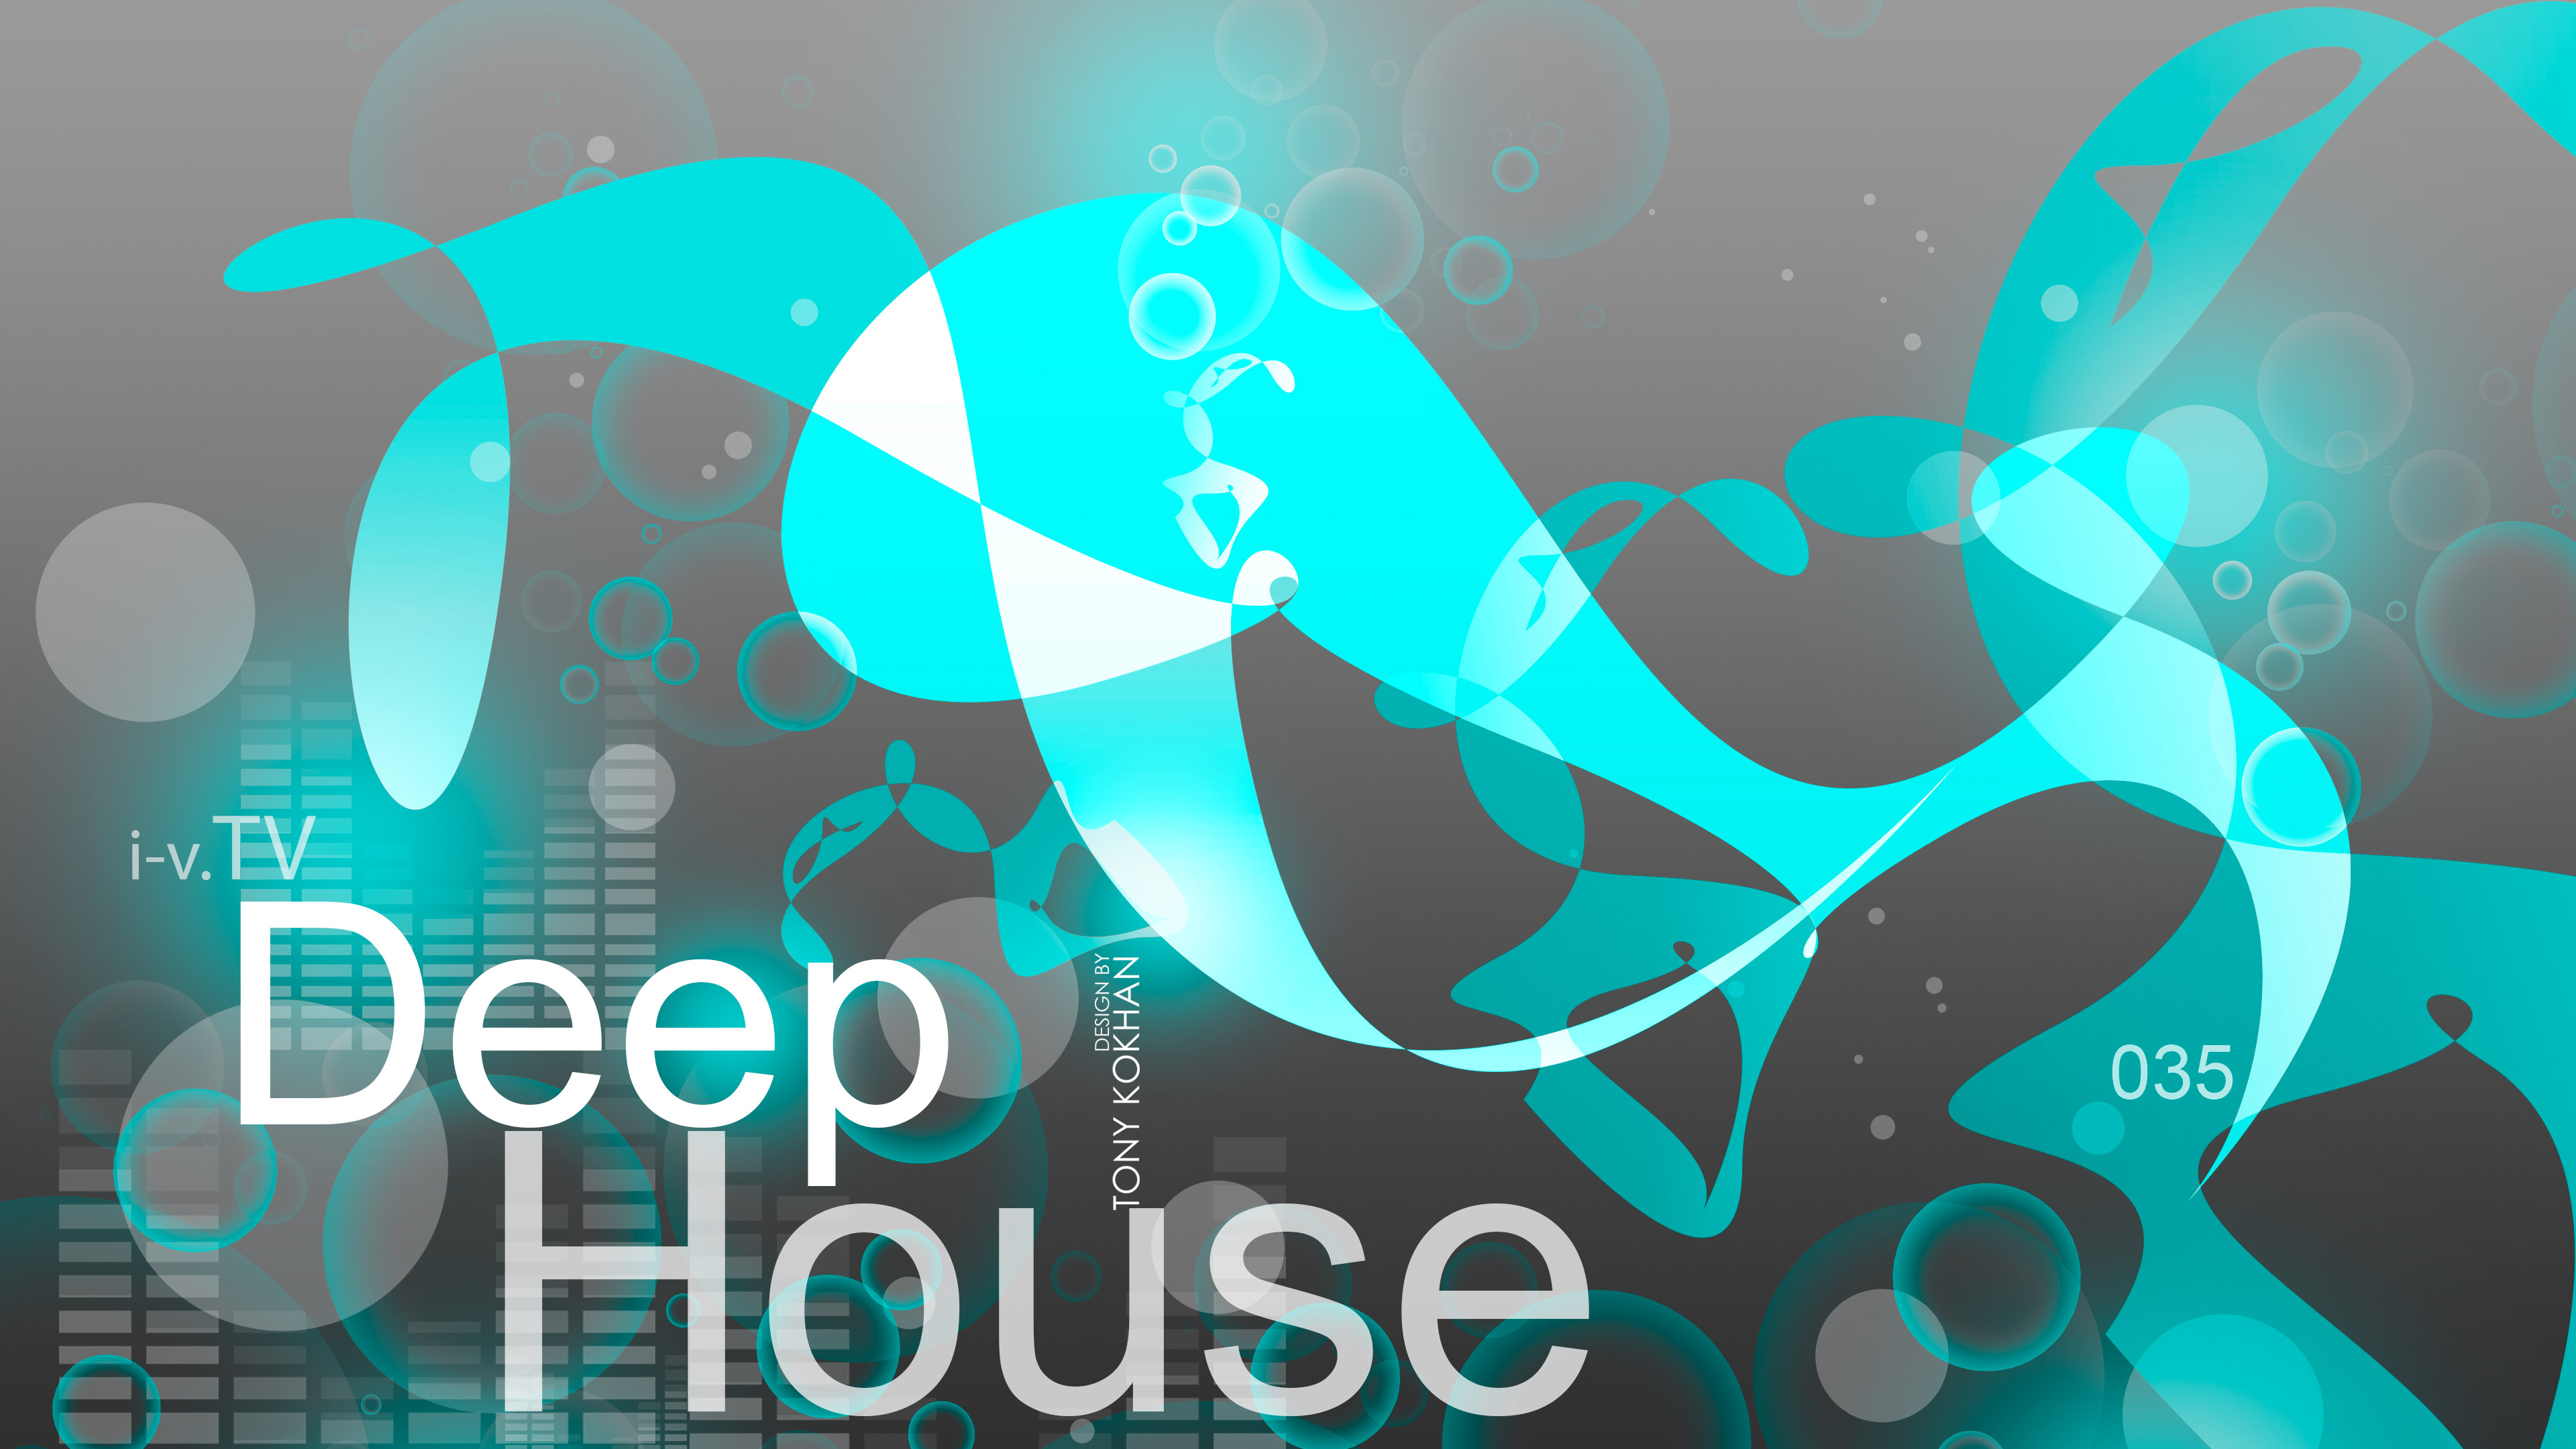 Deep House Music eQ SC Thirty Five 2015 Tony Sound 3840x2160